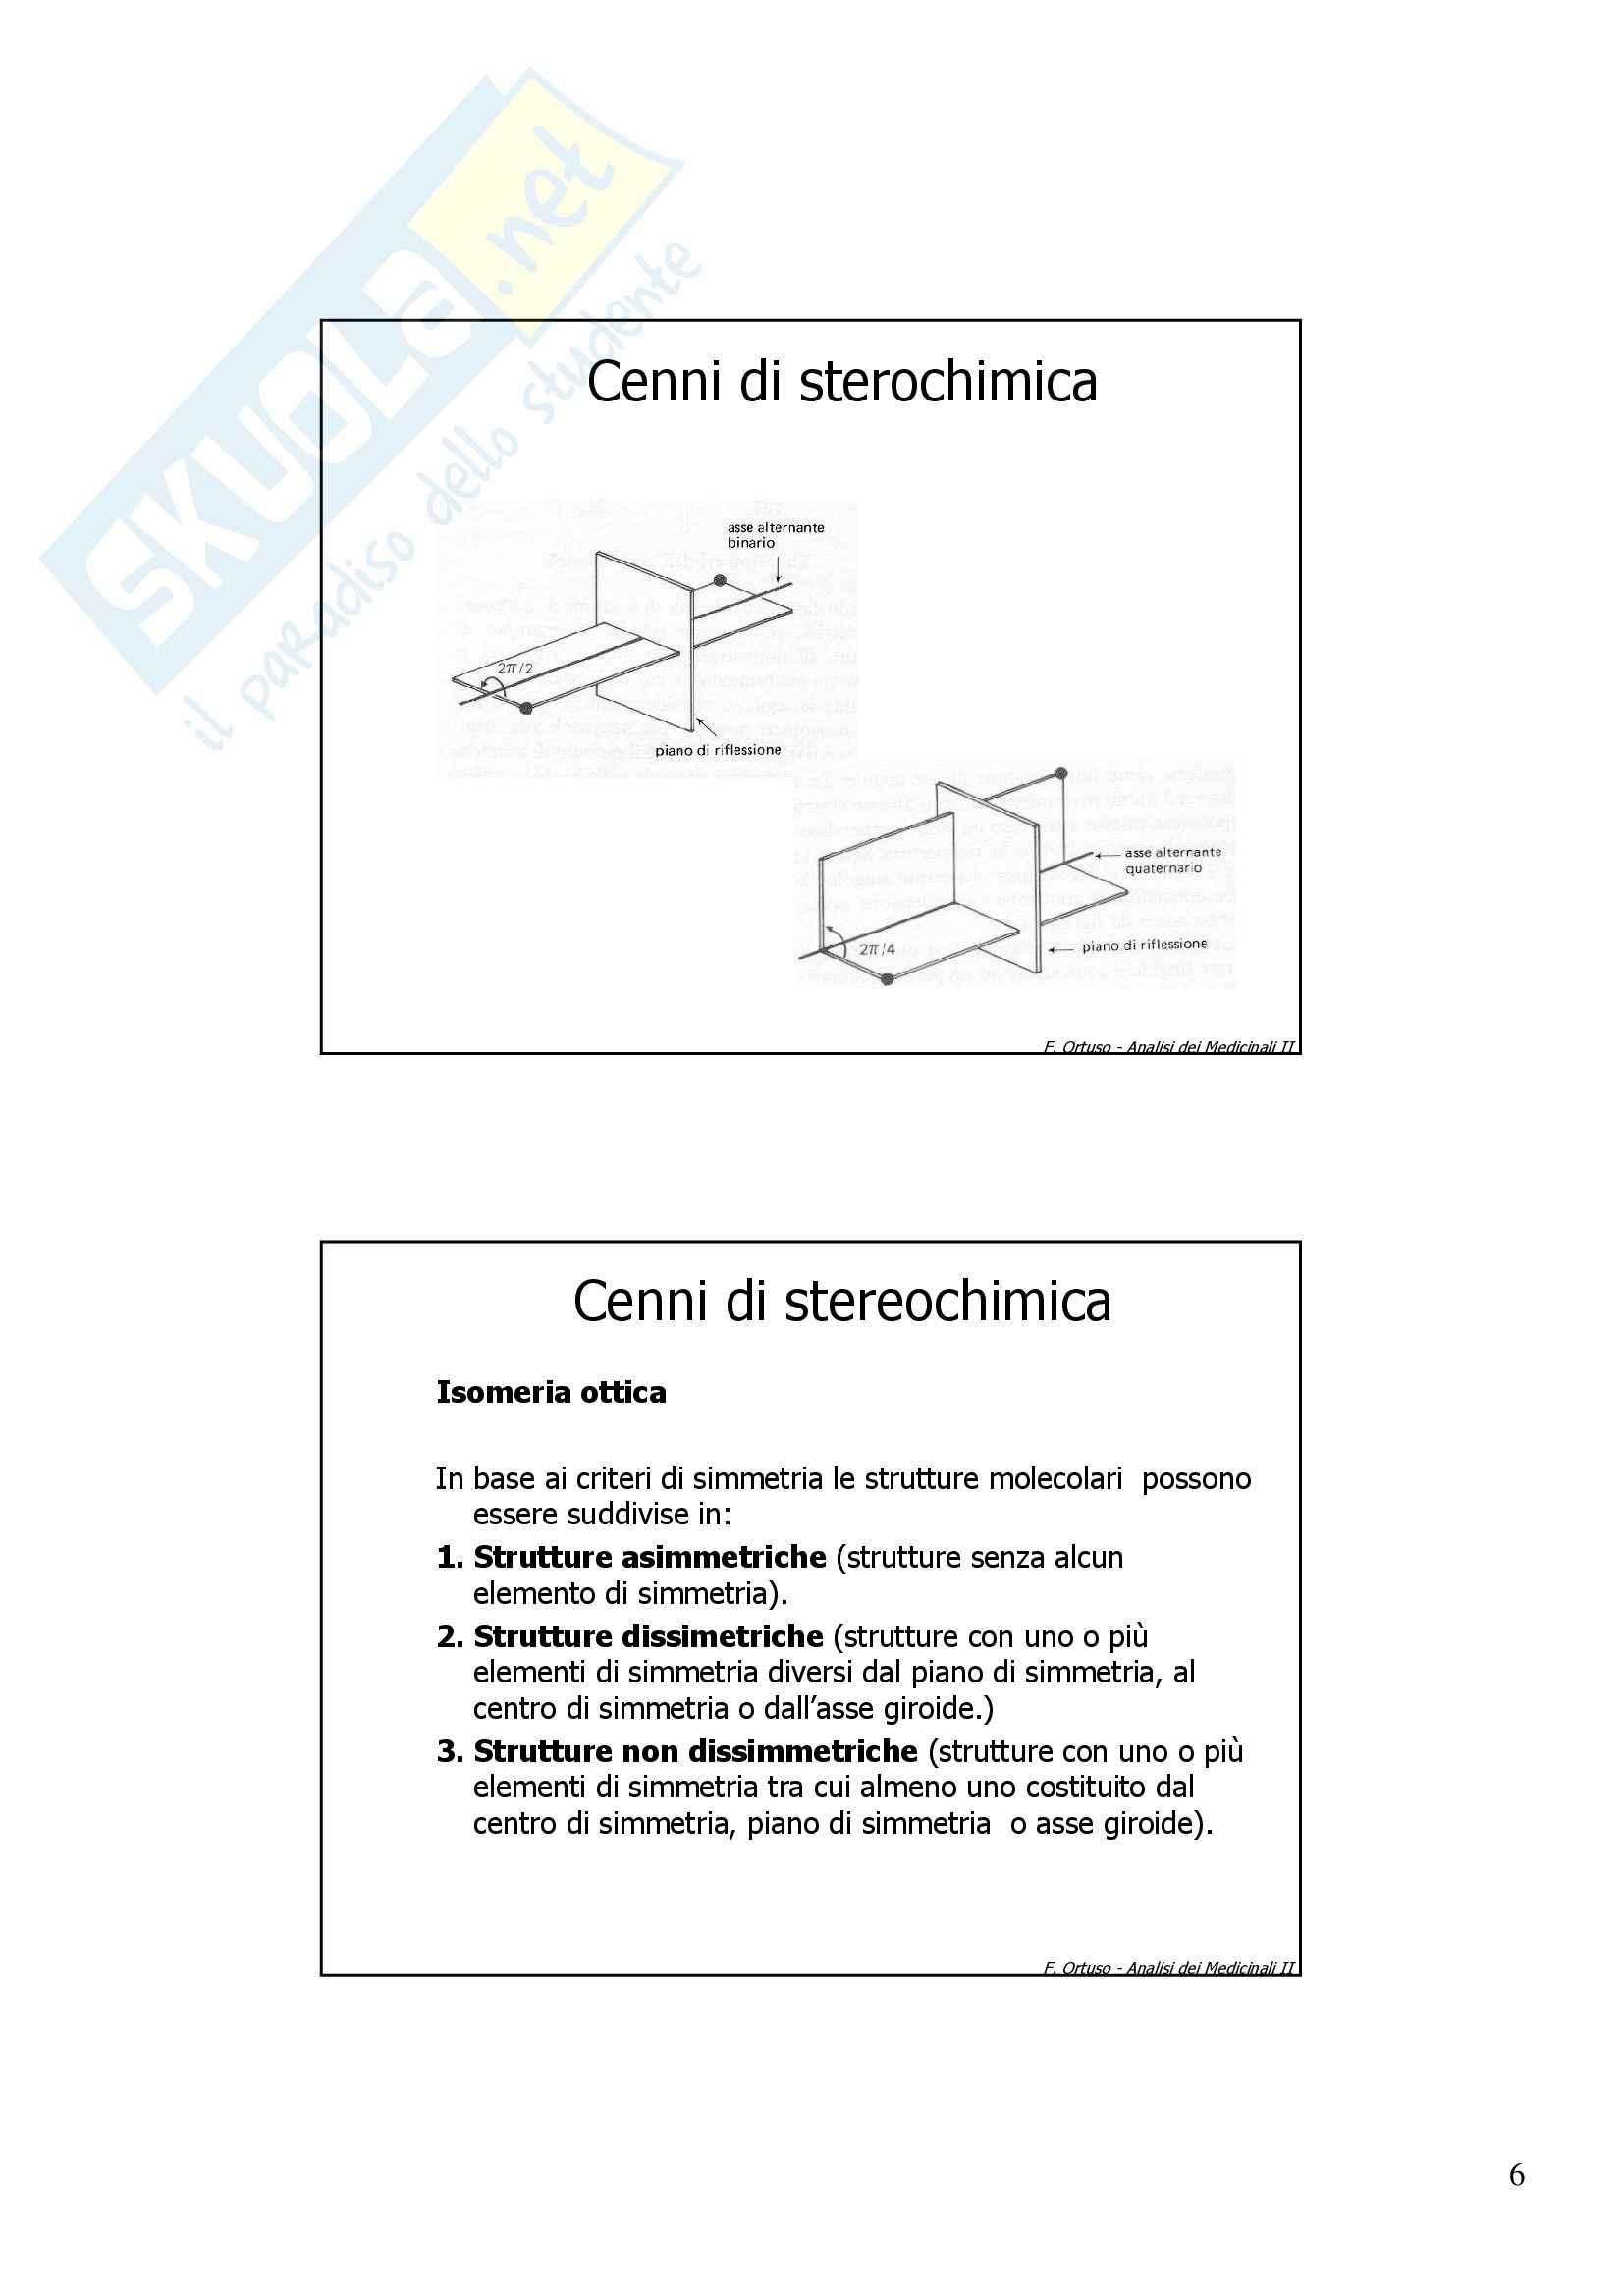 Chimica organica - polarimetria Pag. 6